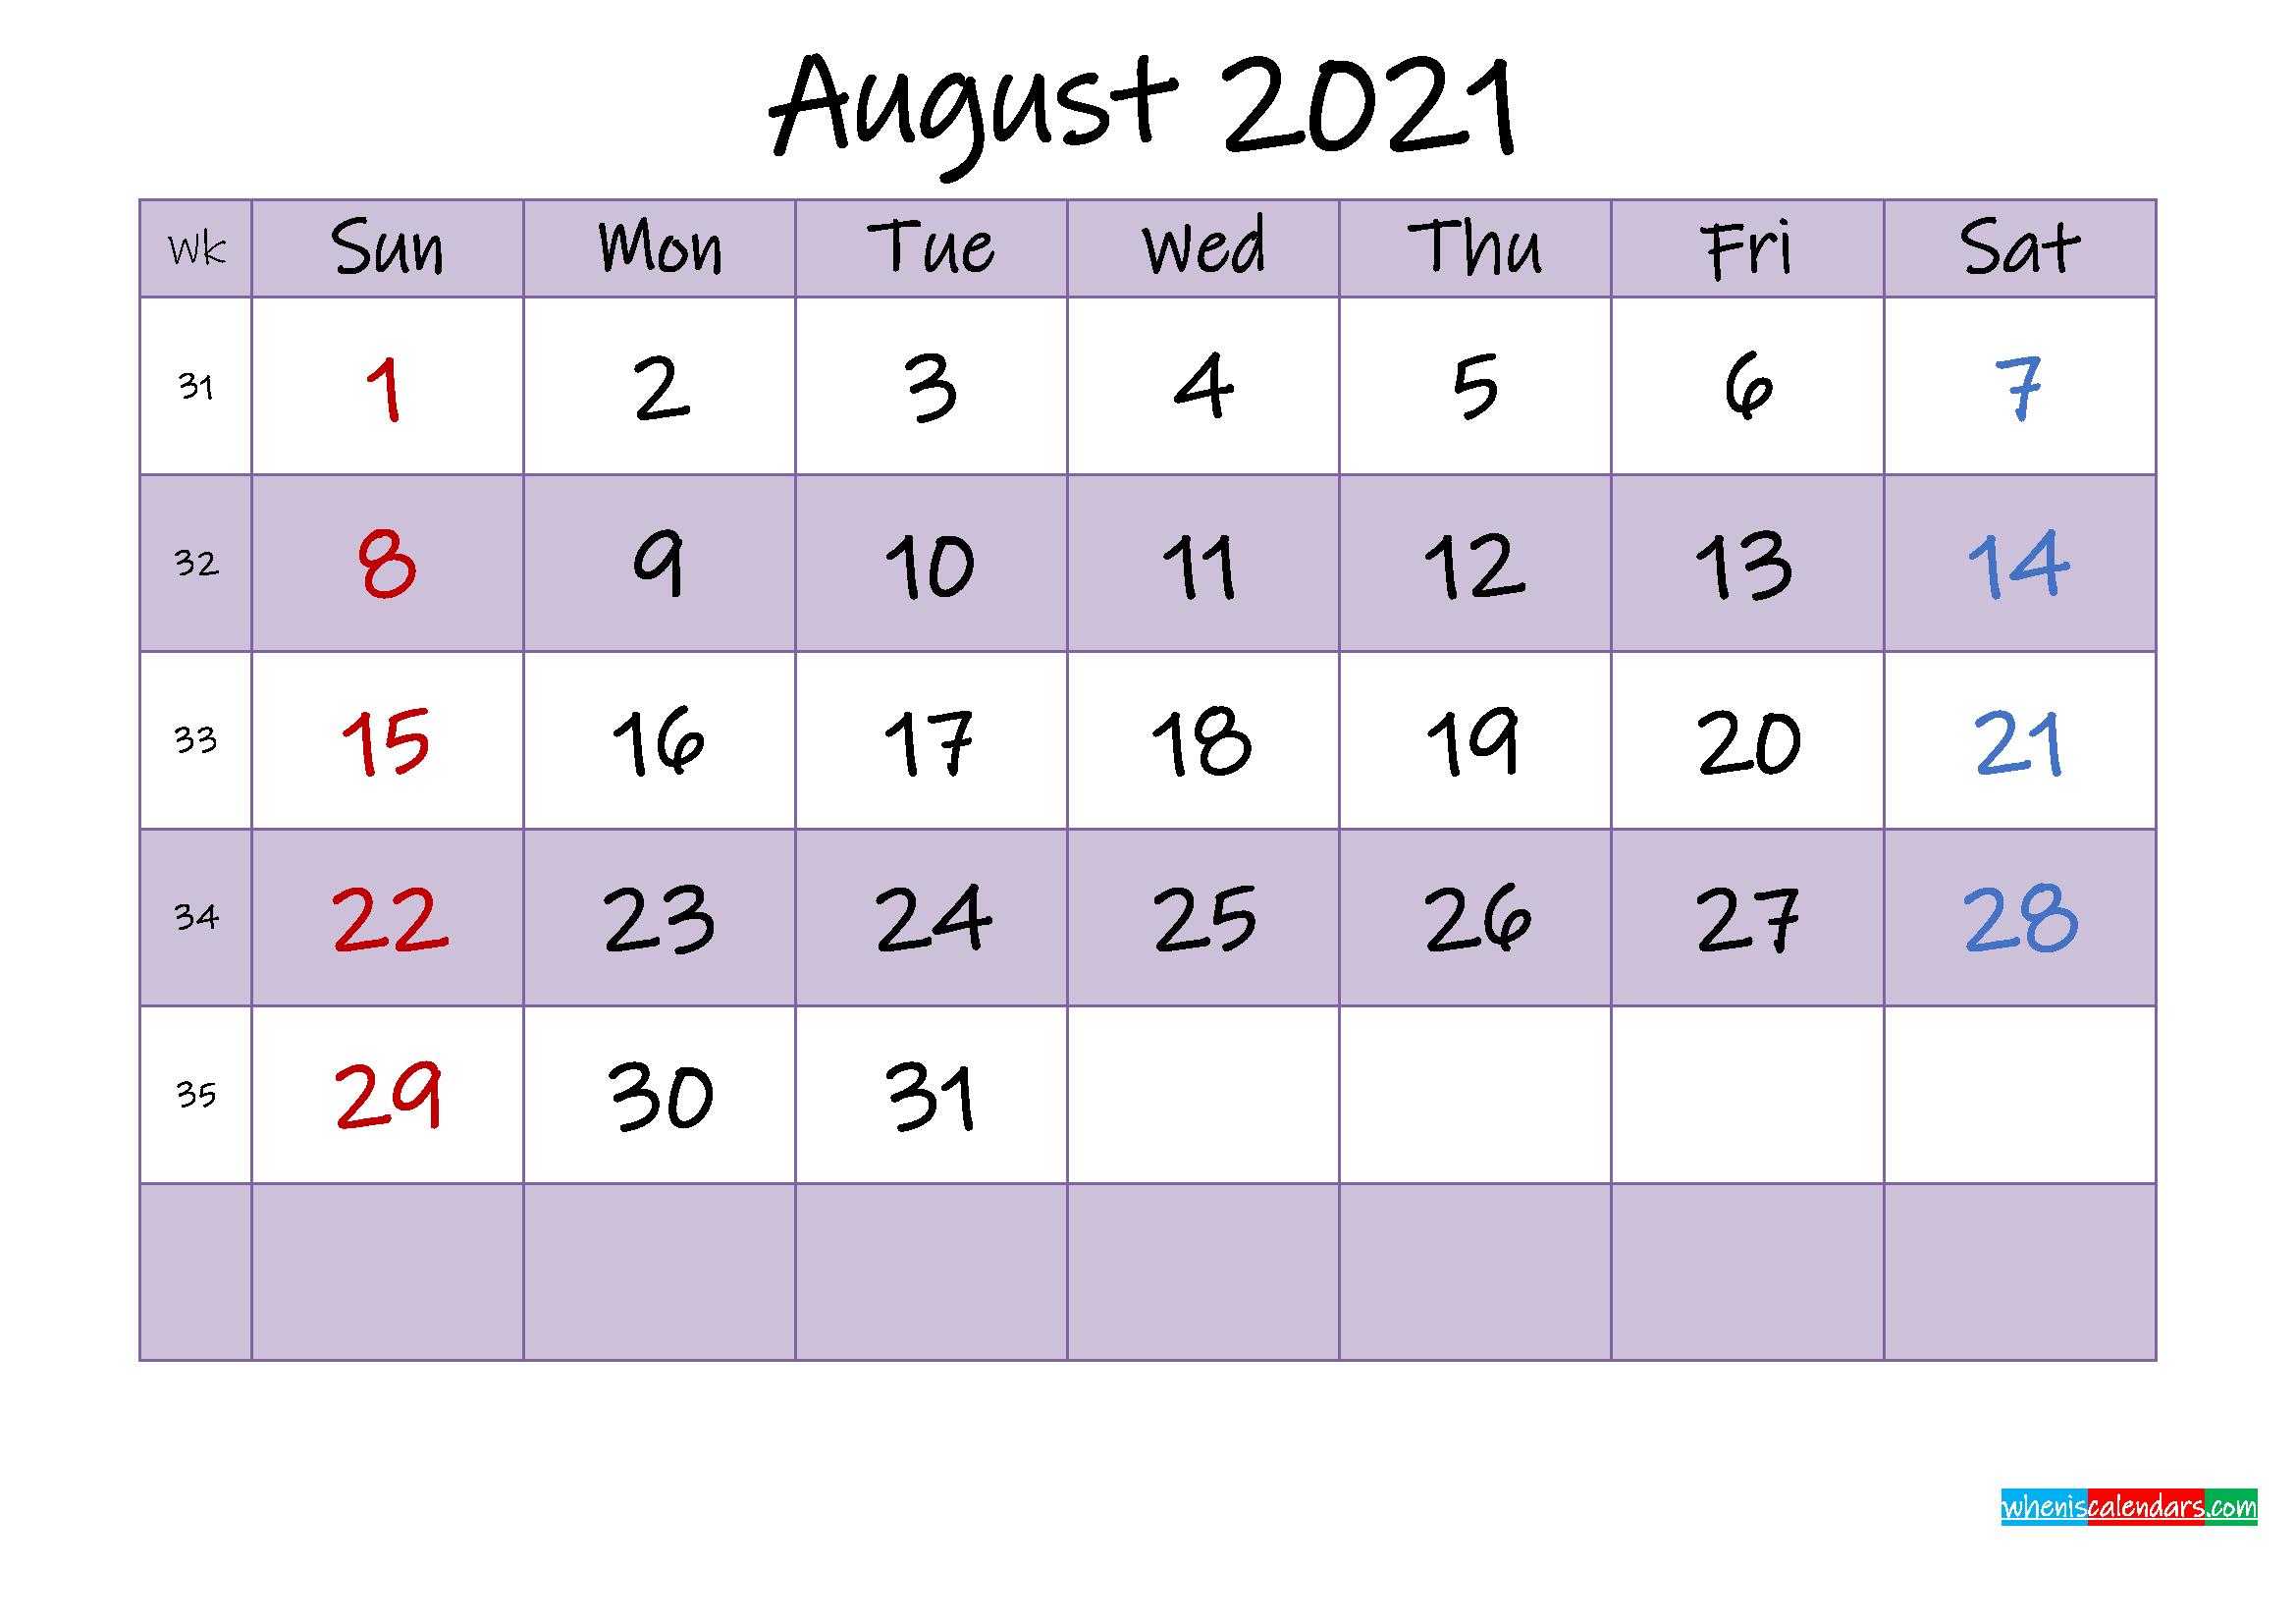 Editable August 2021 Calendar - Template Noink21M464